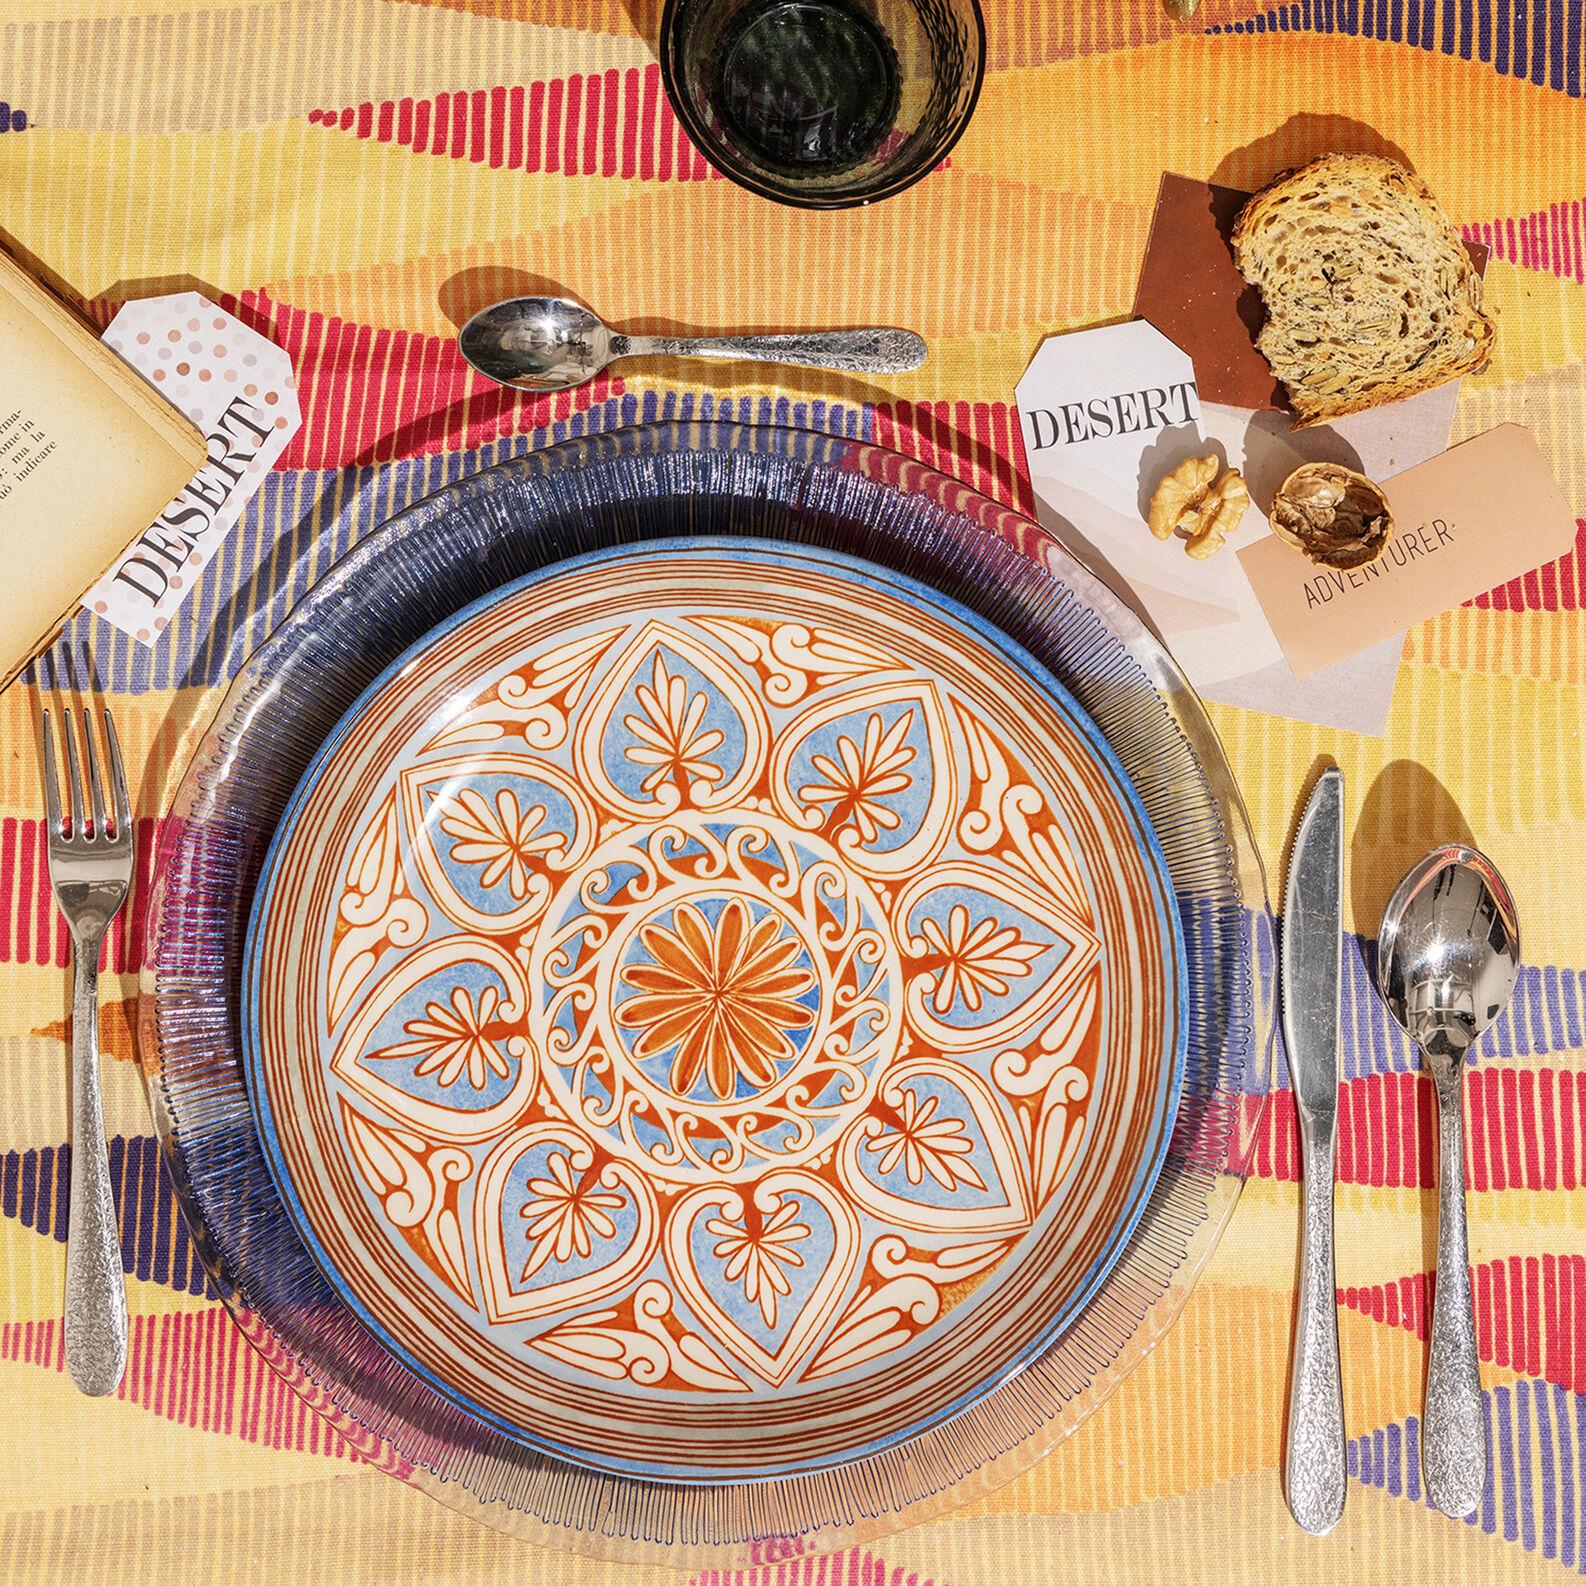 Set of 18 Majolica ceramic plates